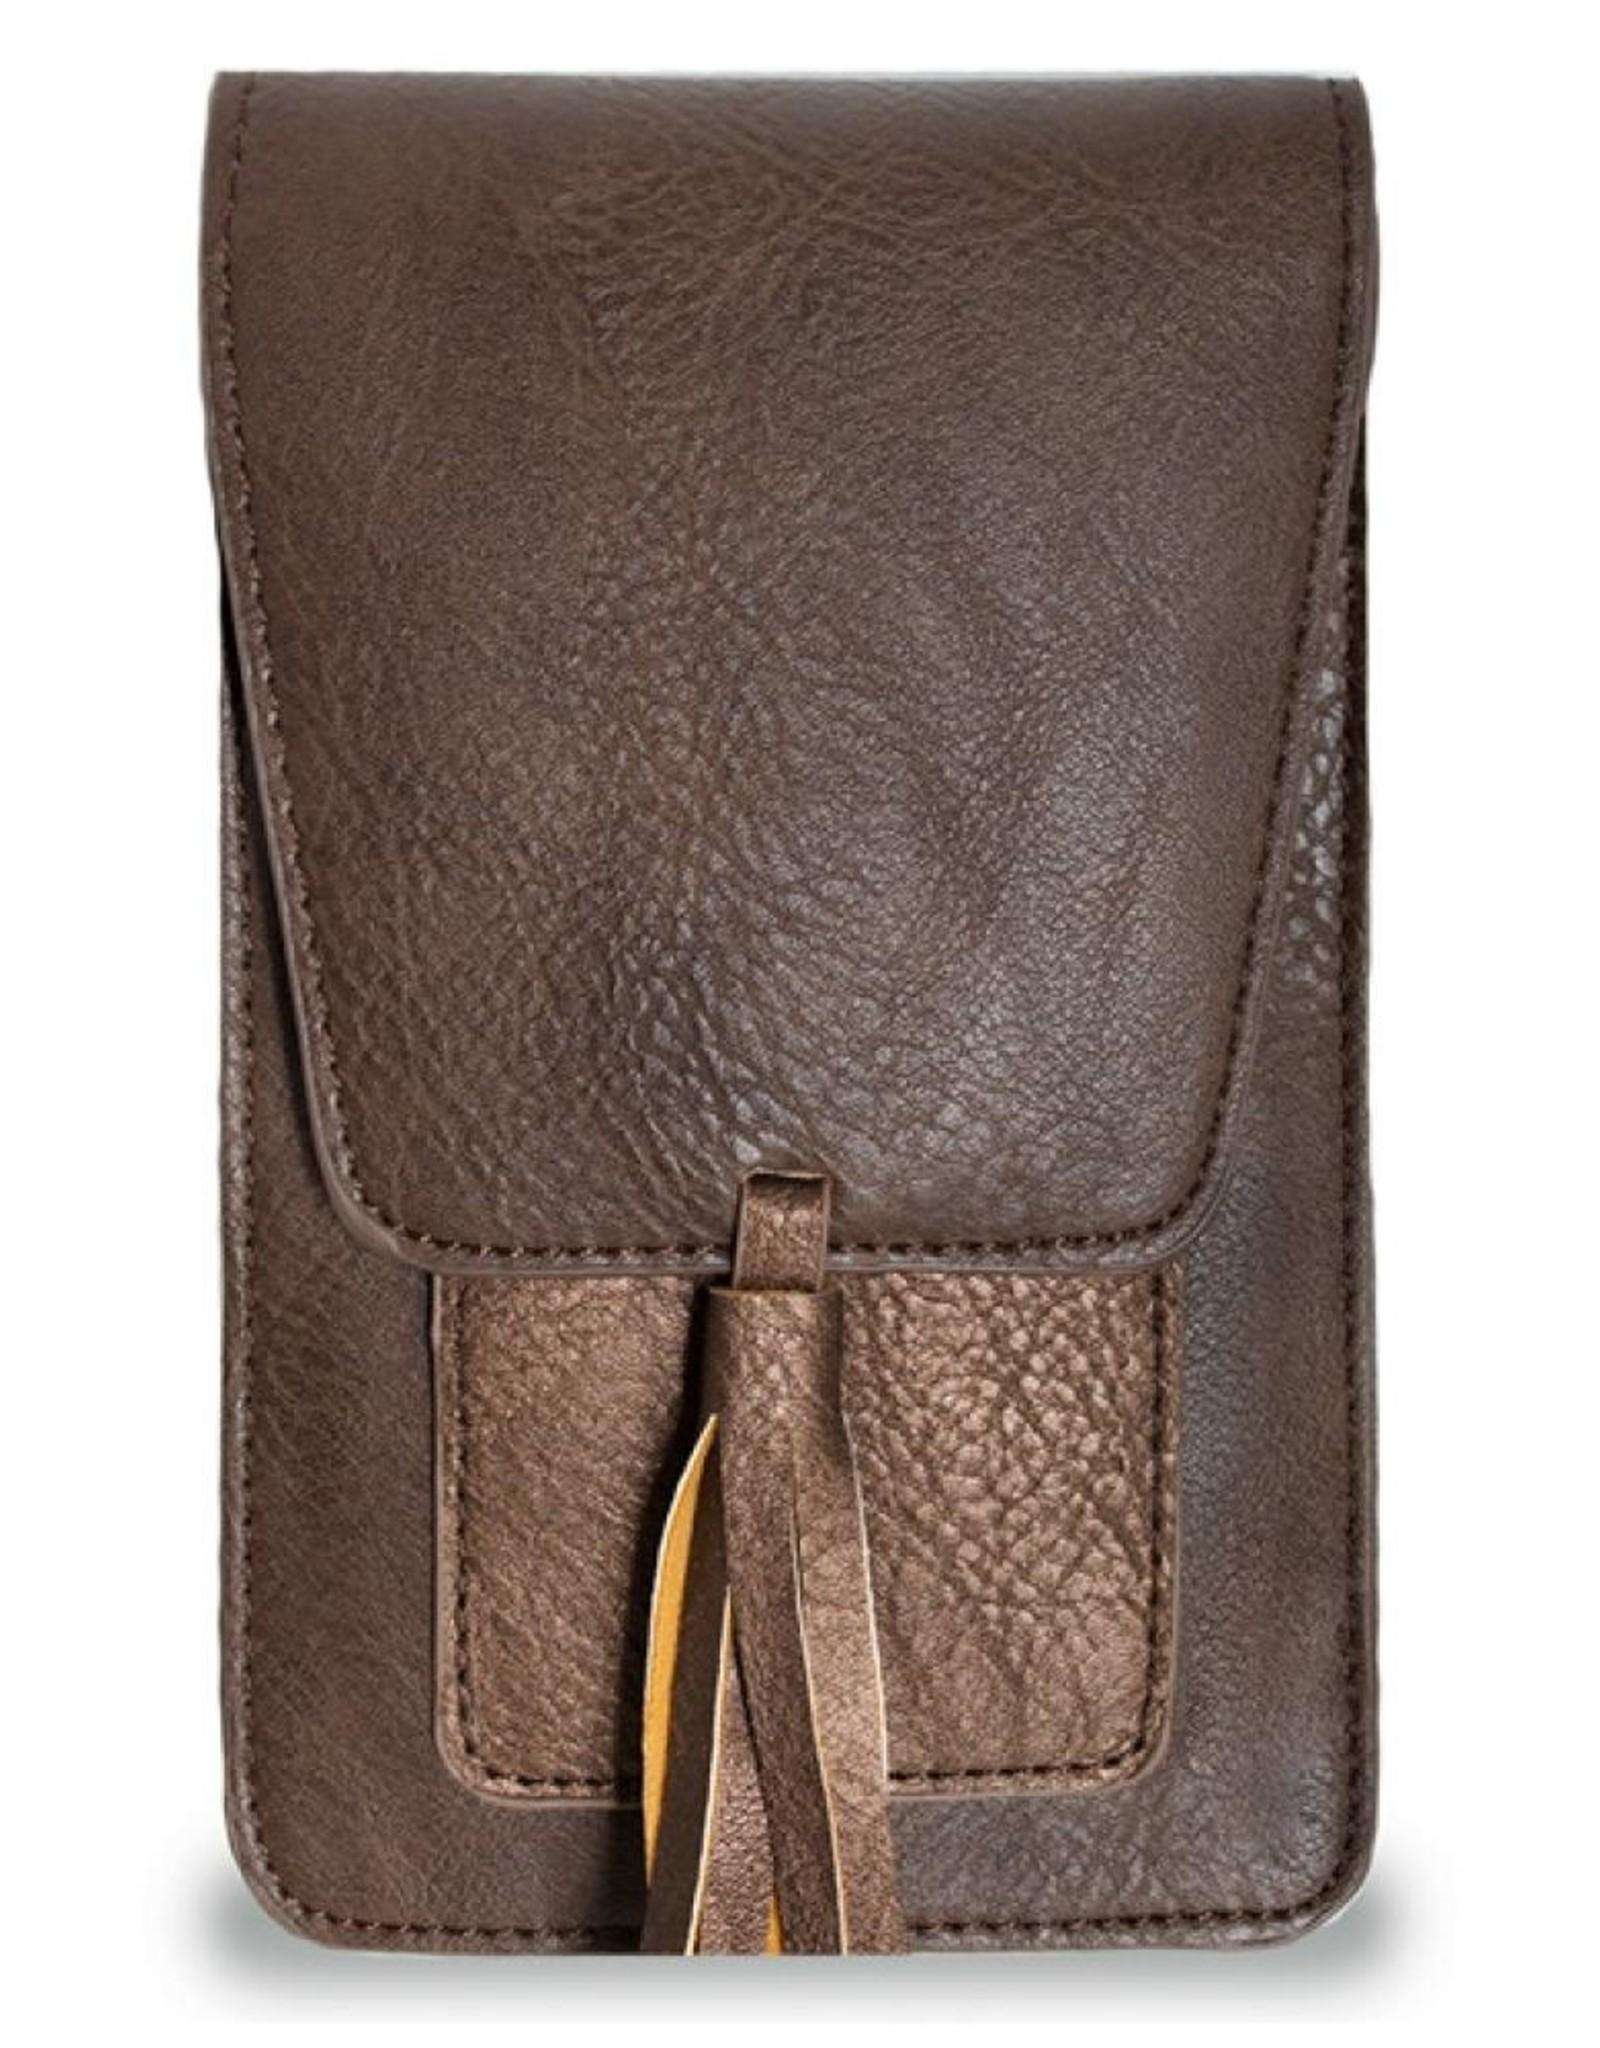 Vegan Crossbody Bag with Tassel